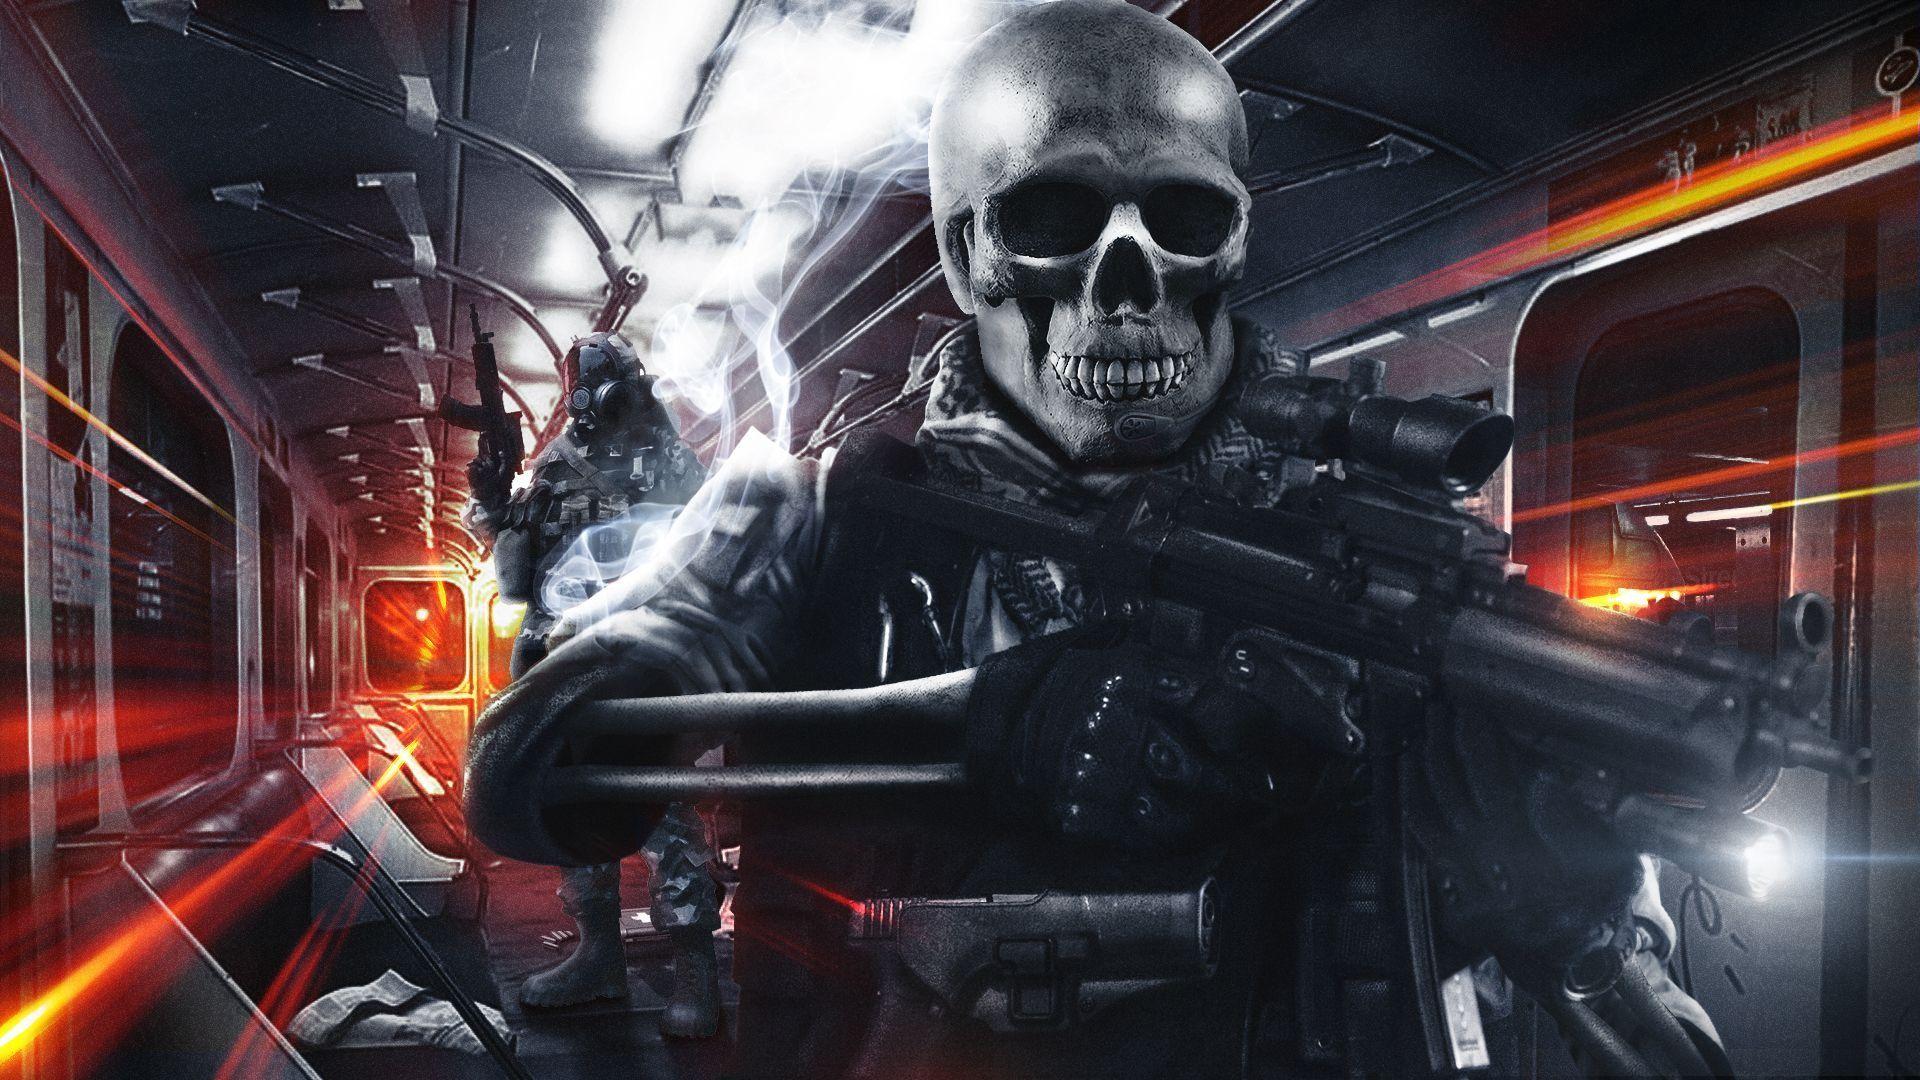 Battlefield 3 wallpaper 16